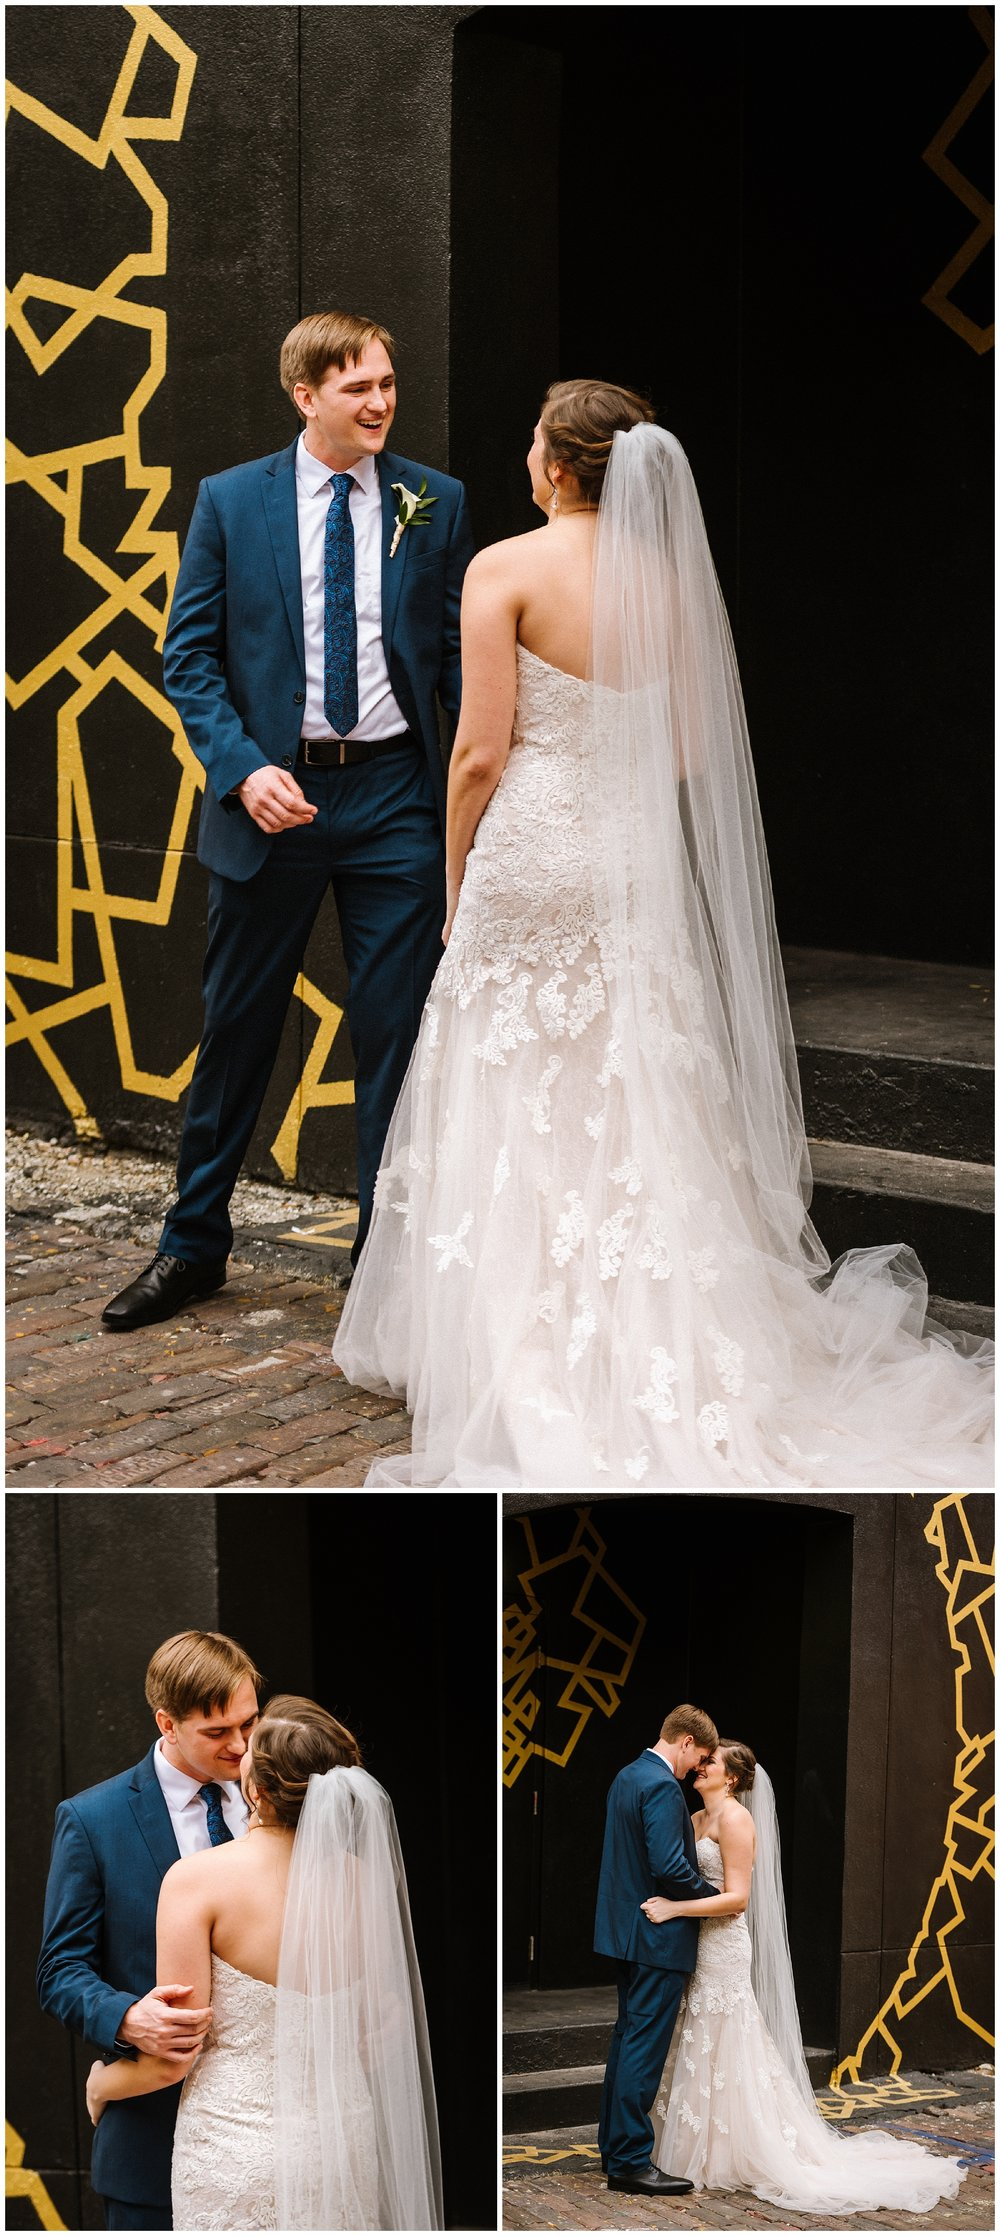 St-pete-wedding-photography-unique-glass-blowing-gallery-succulent-art_0013.jpg